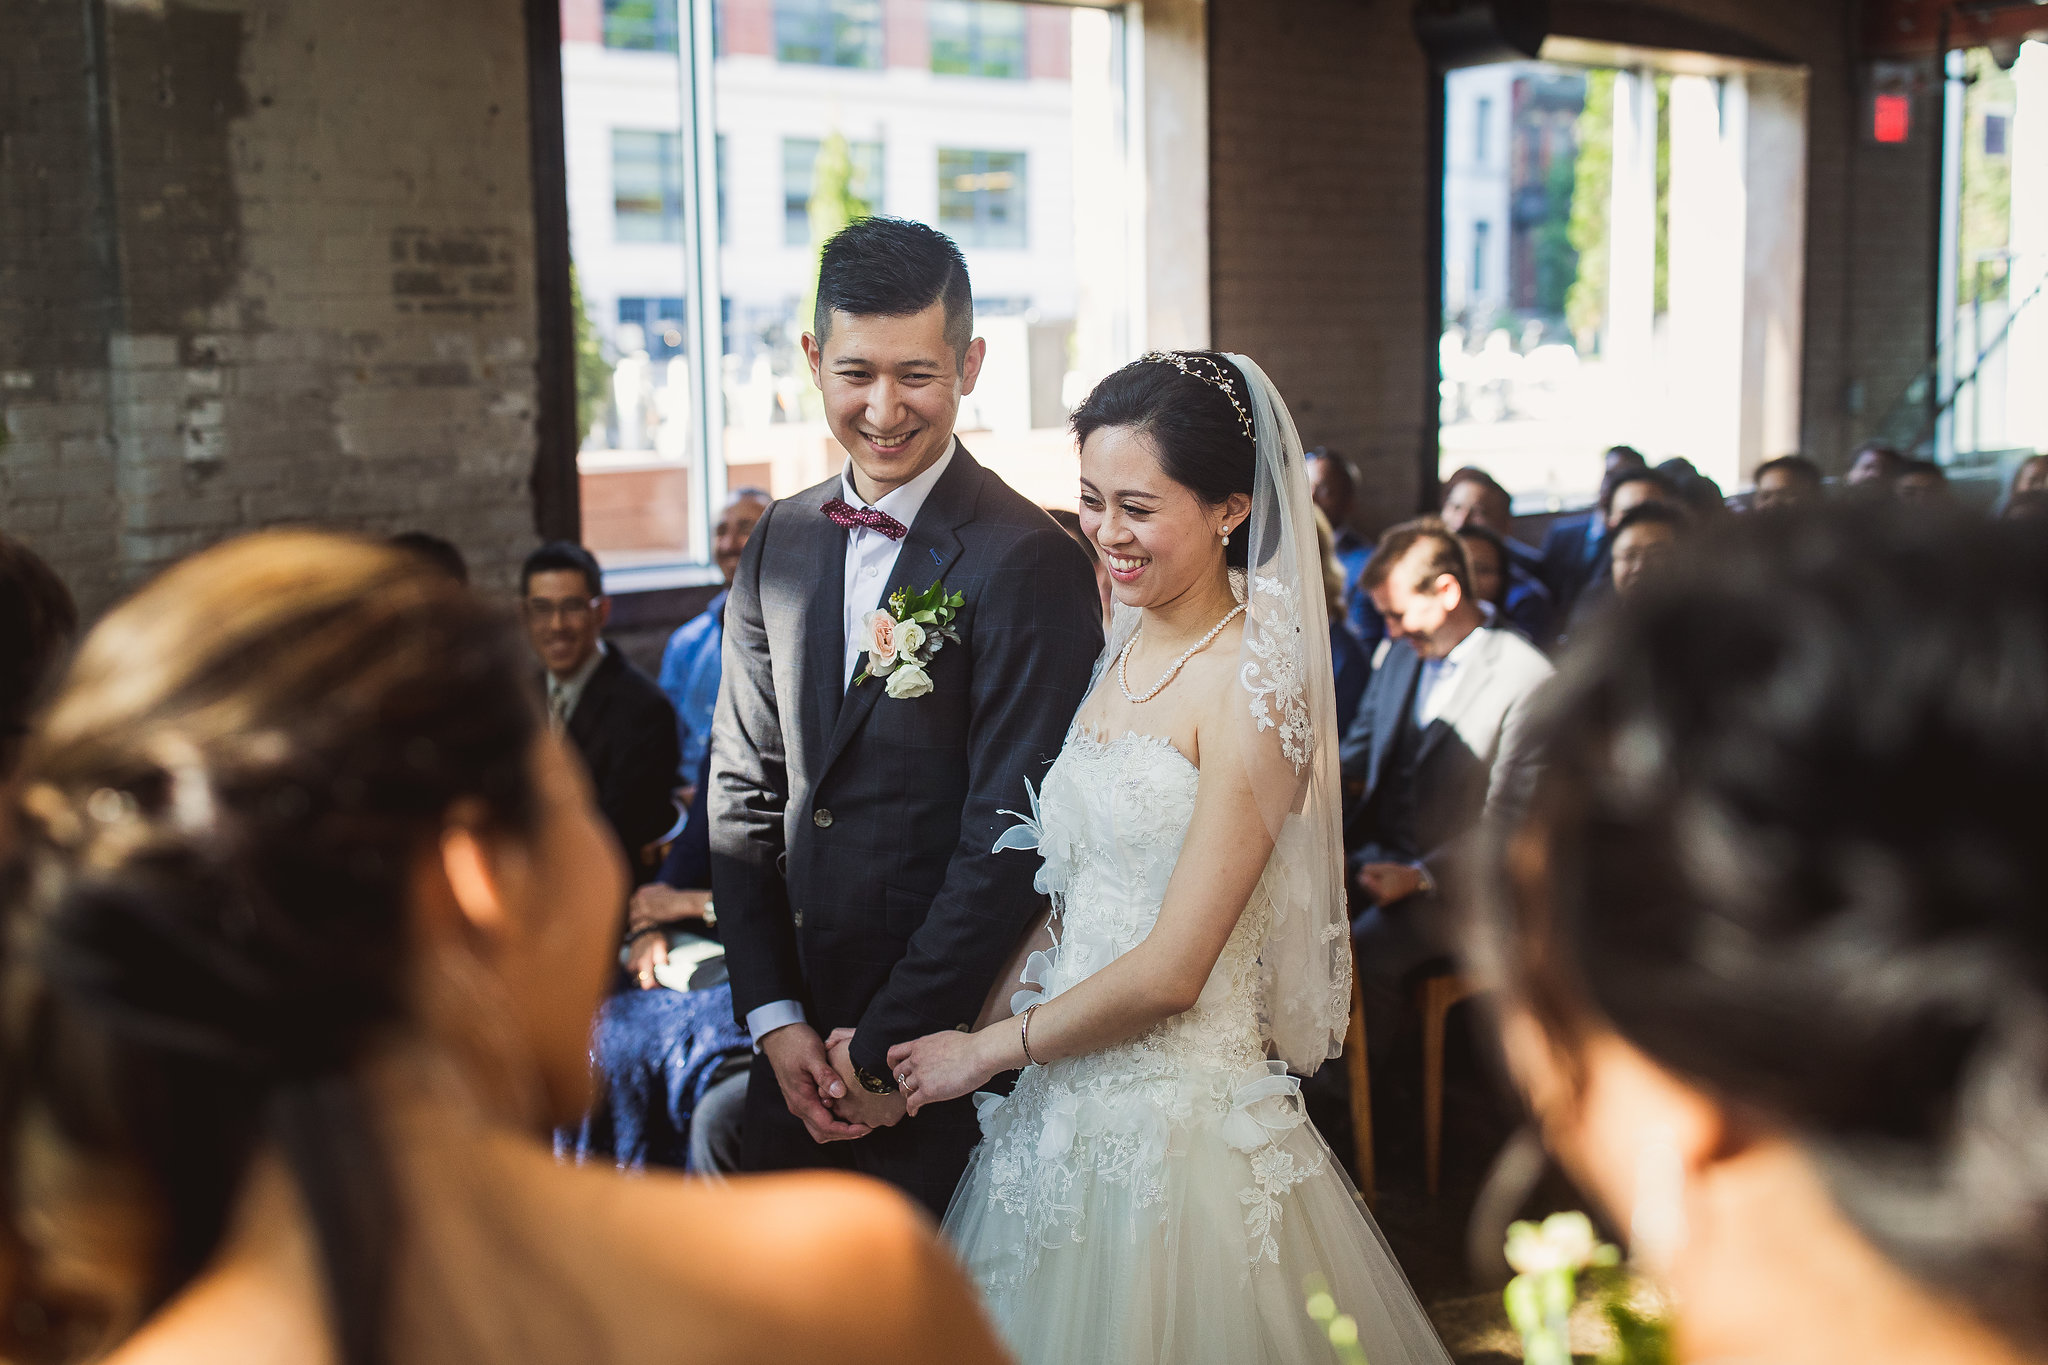 Jessica Jason Hotel Ocho Wedding Photos 368 - Hotel Ocho Wedding